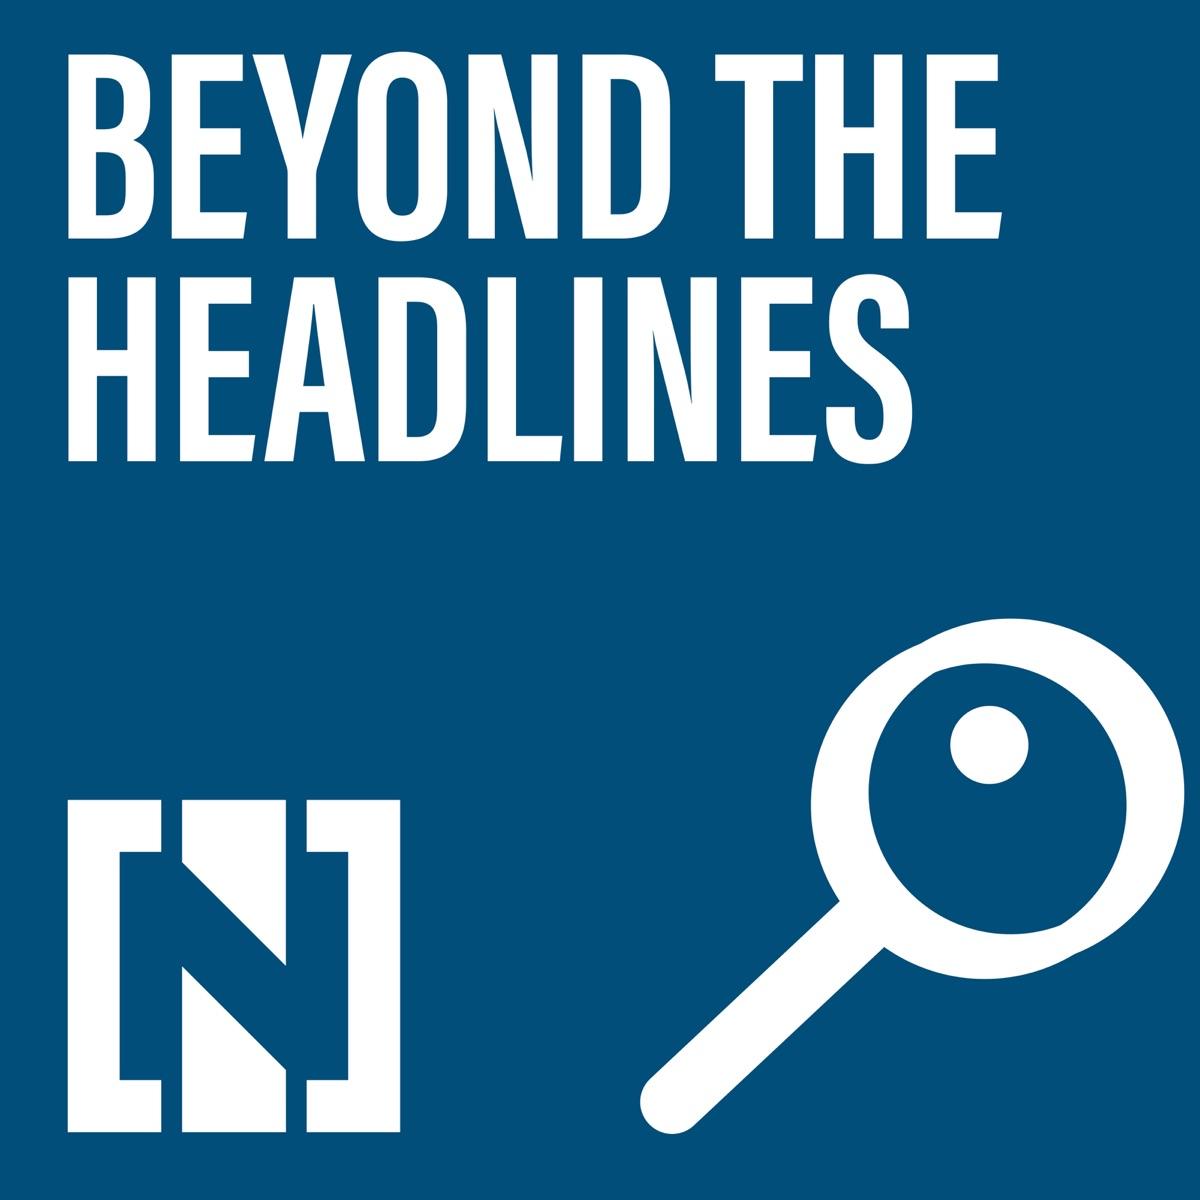 Beyond the Headlines